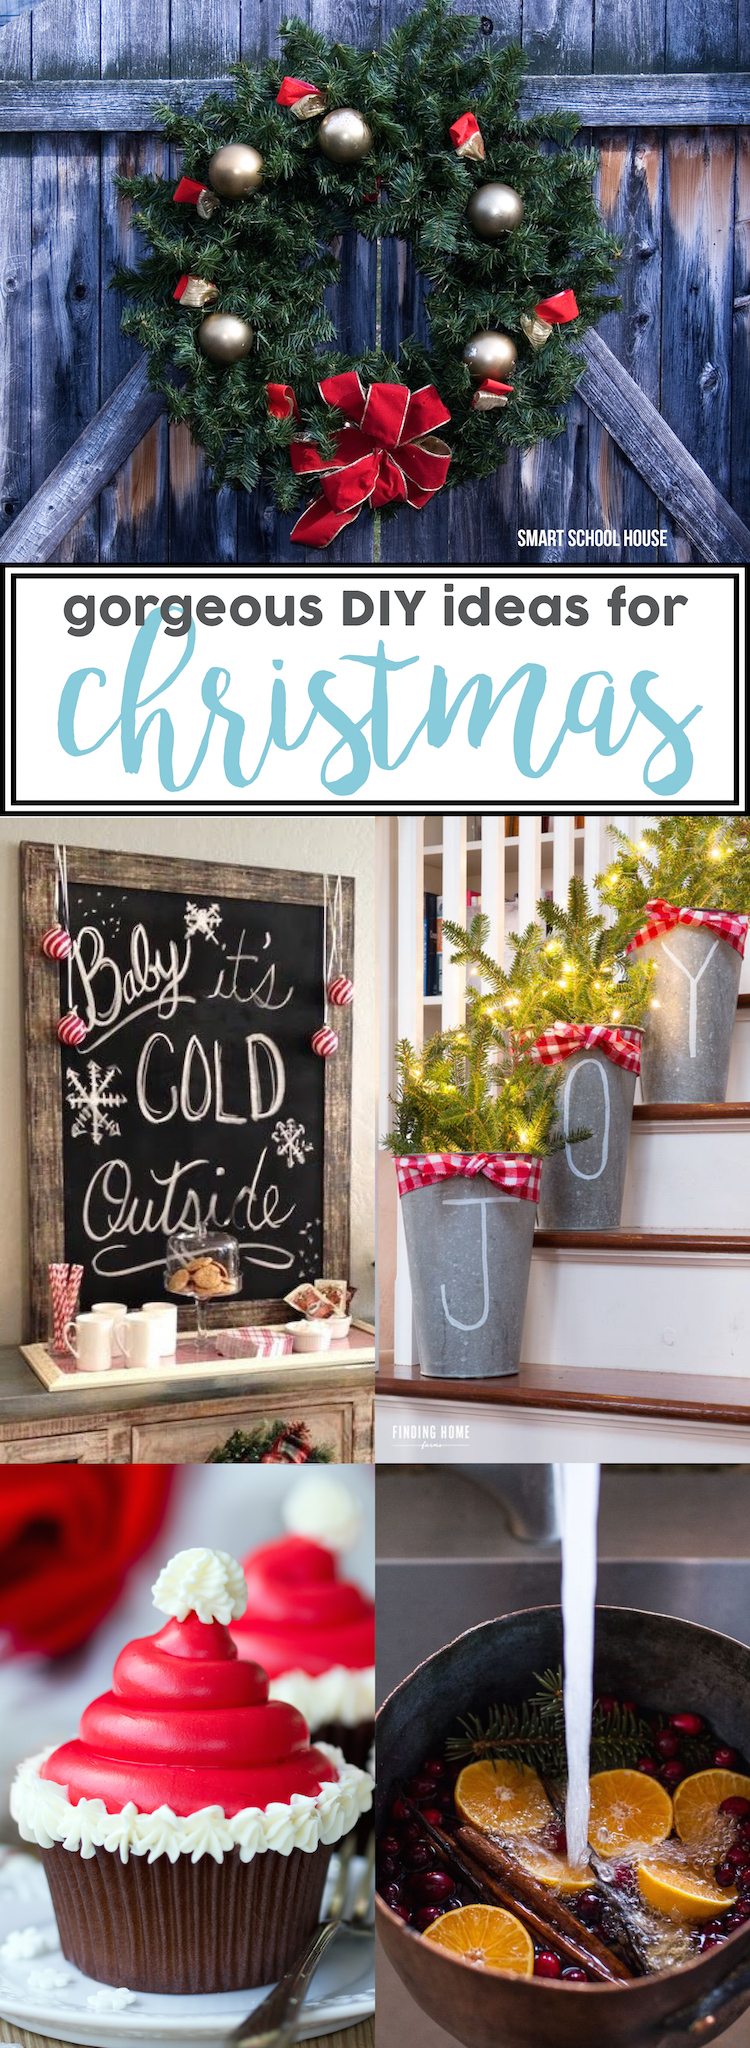 DIY Christmas Ideas - Page 25 of 25 - Smart School House